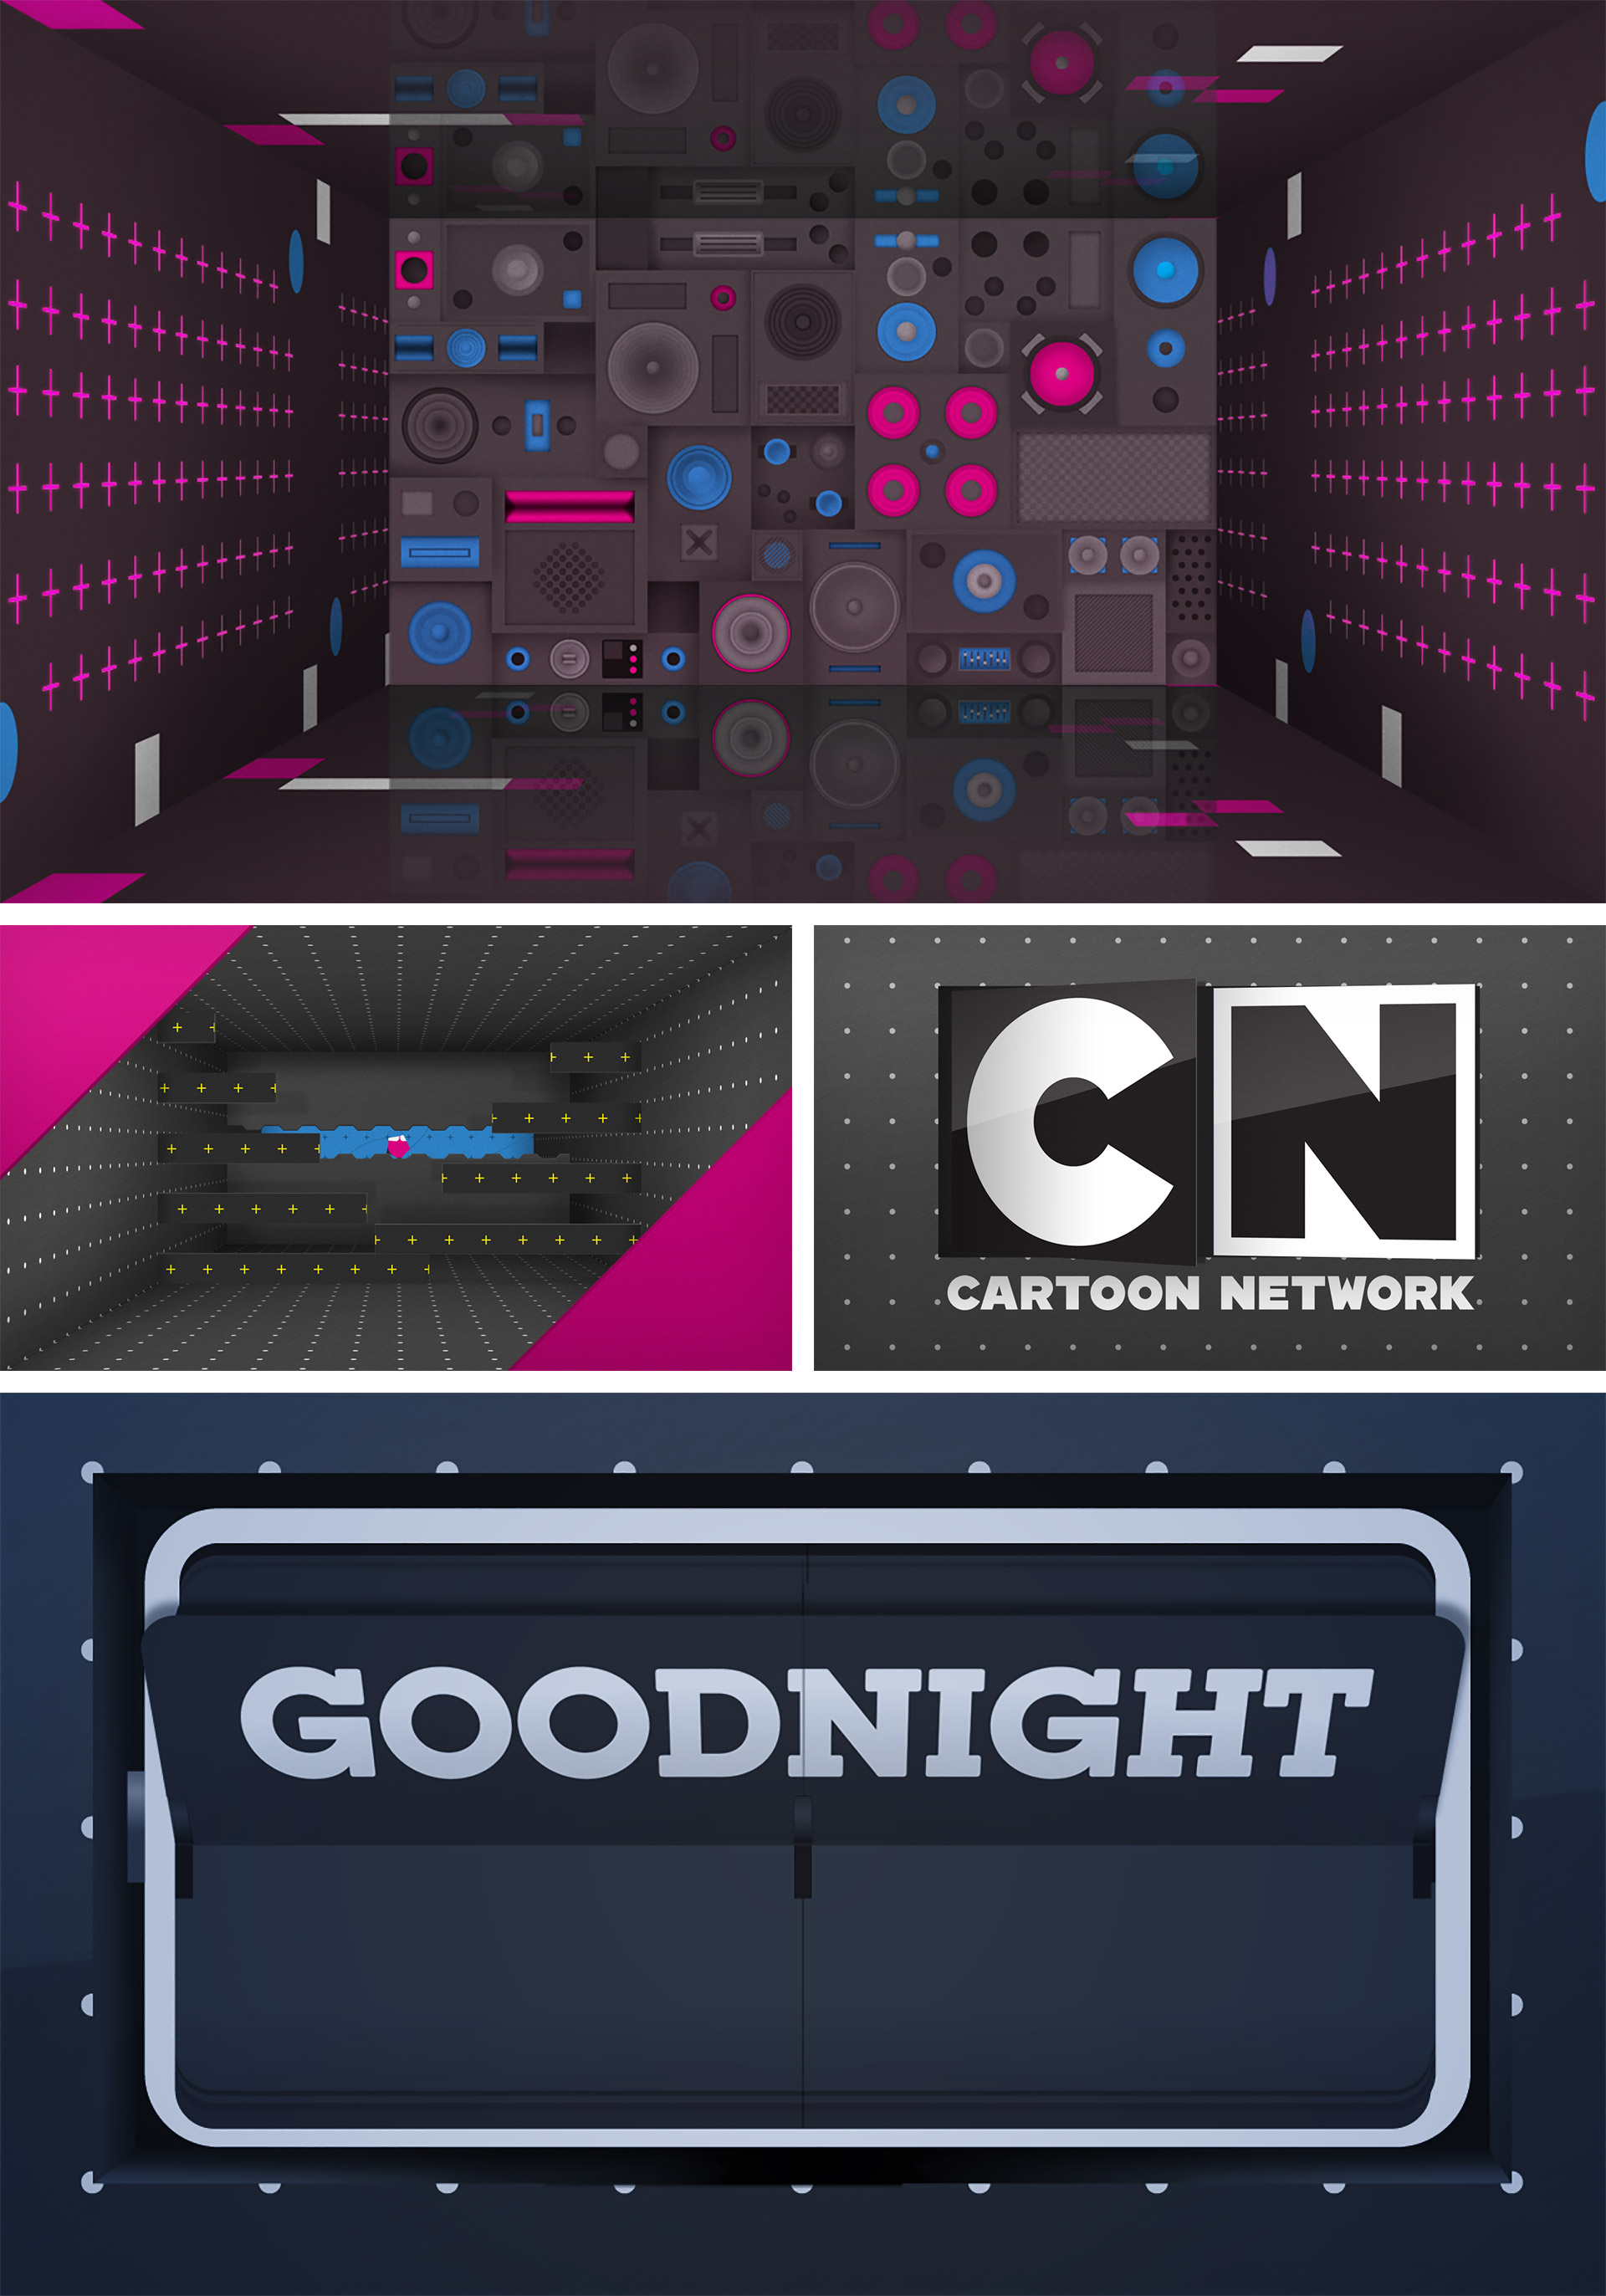 cartoon_network_rebrand_boards_04.jpg